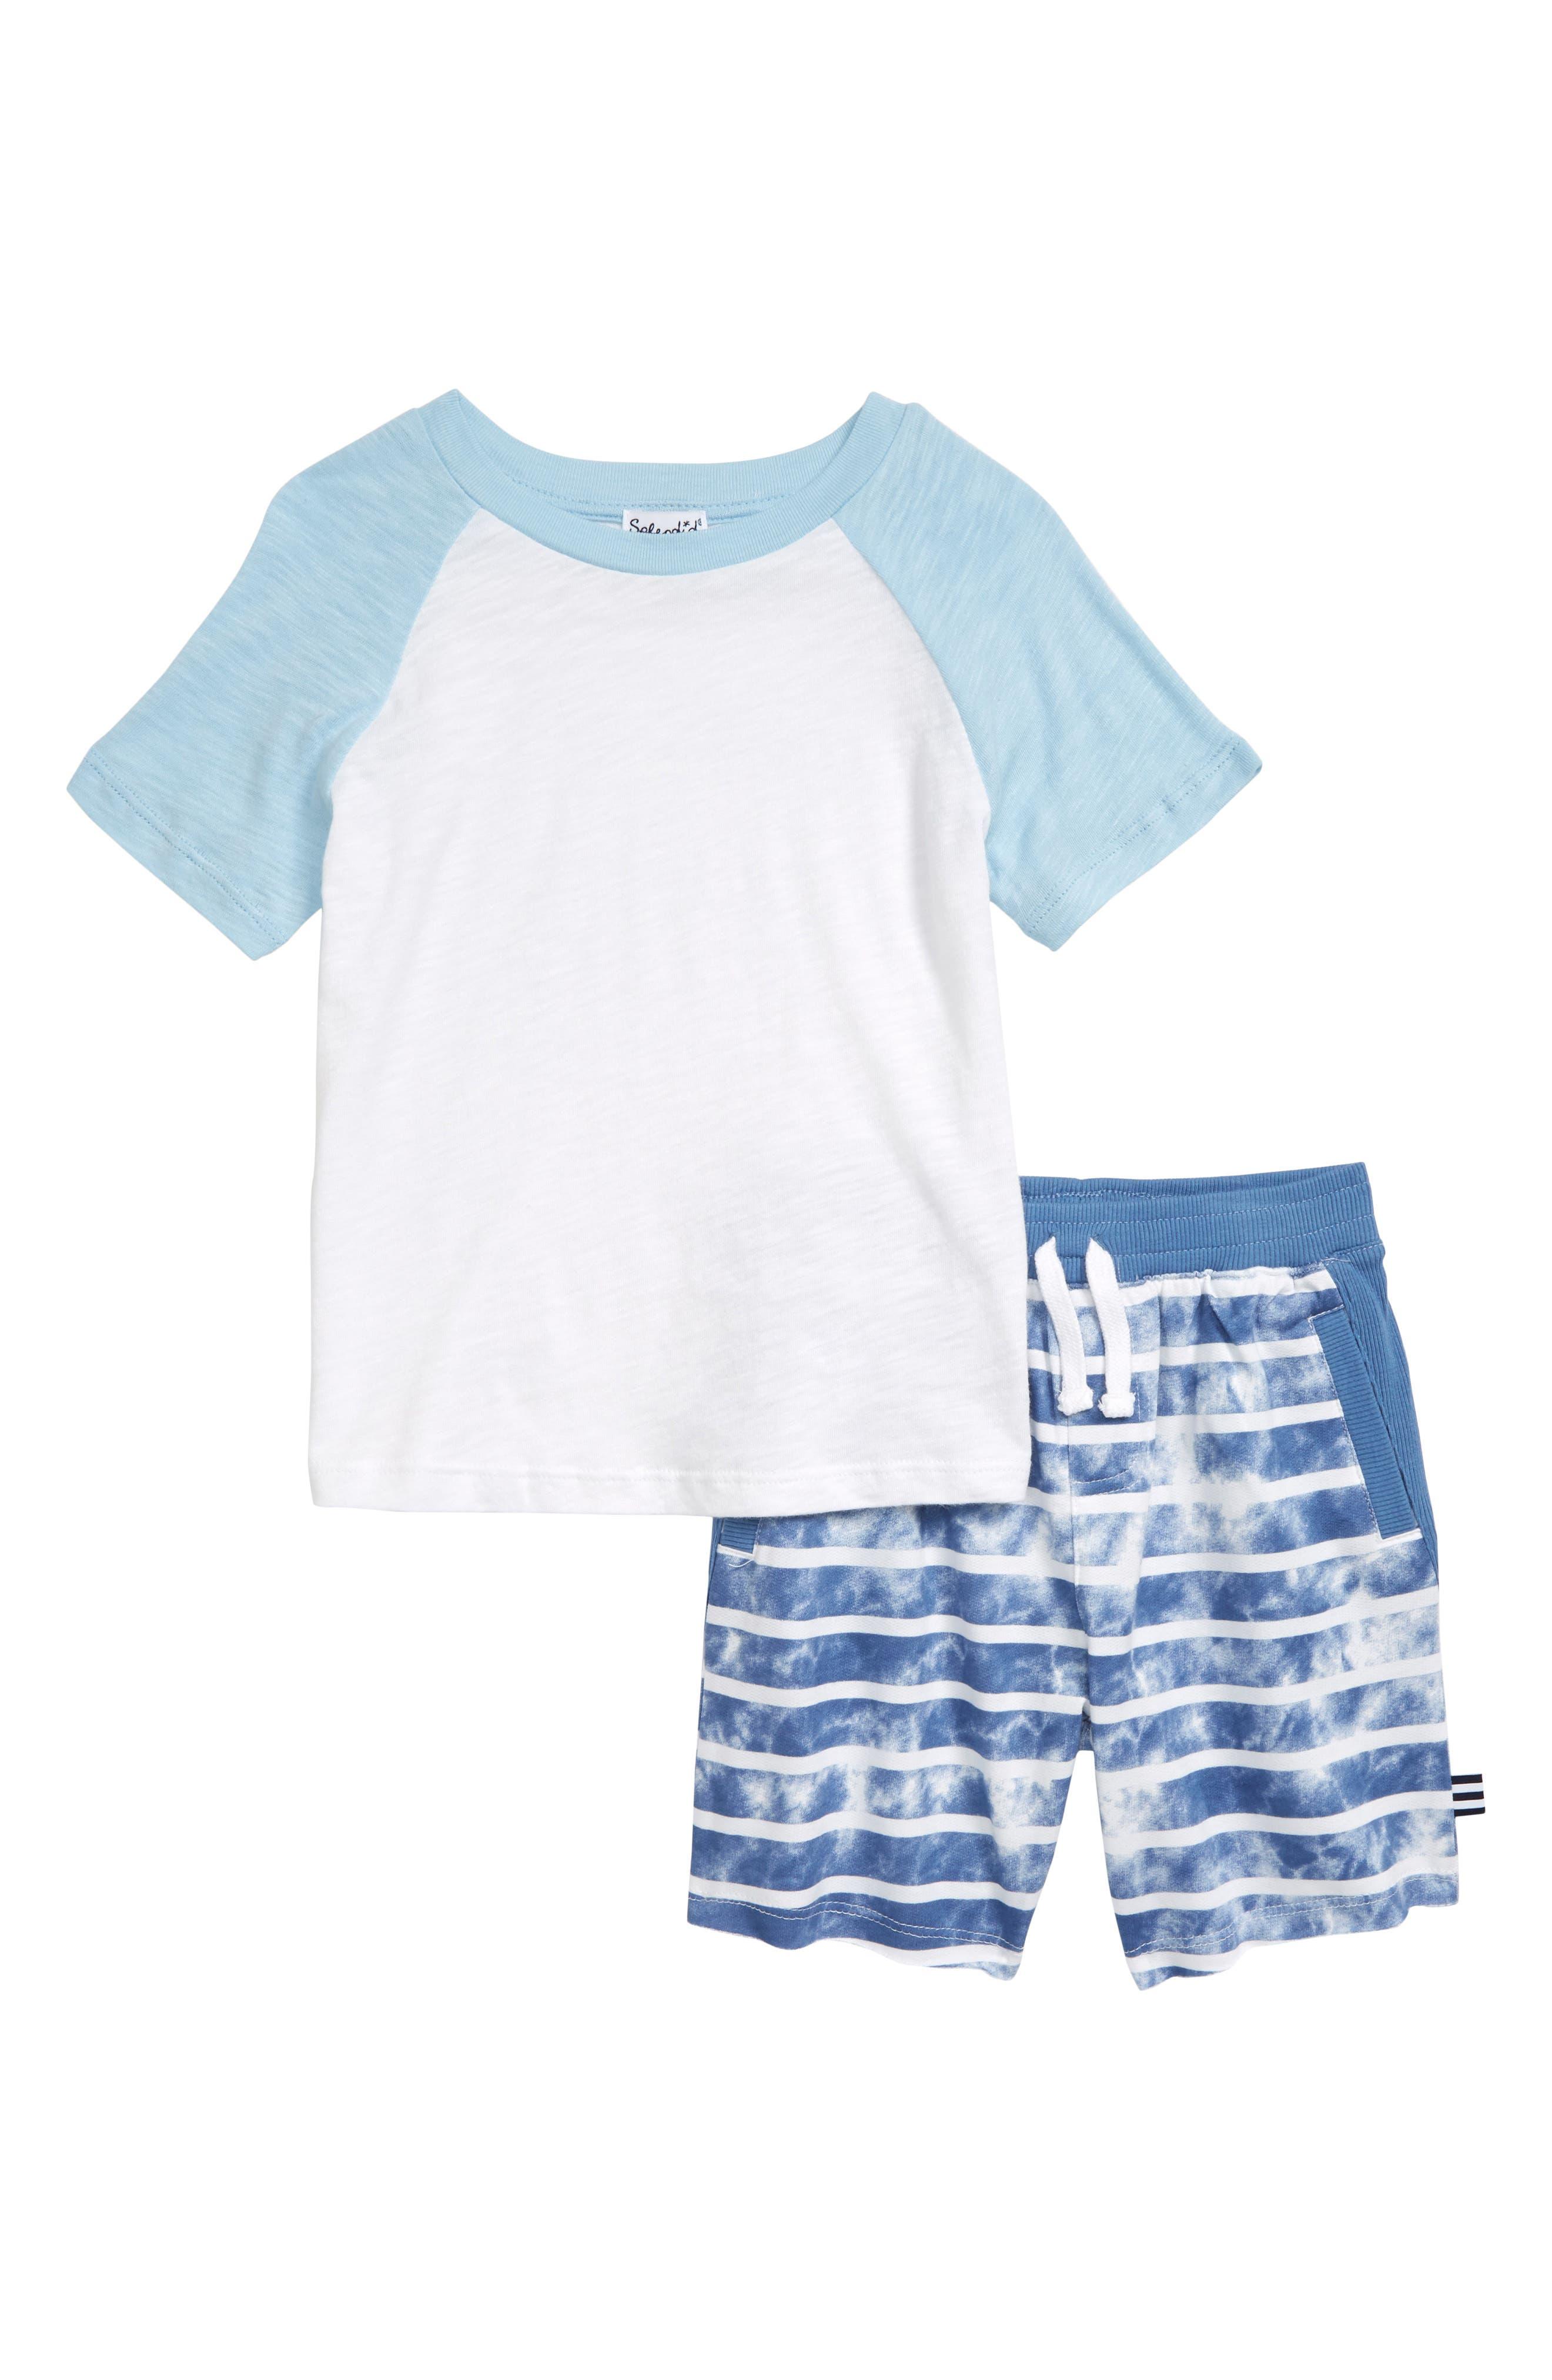 Toddler Boys Splendid Raglan Shirt  Tie Dye Stripe Shorts Set